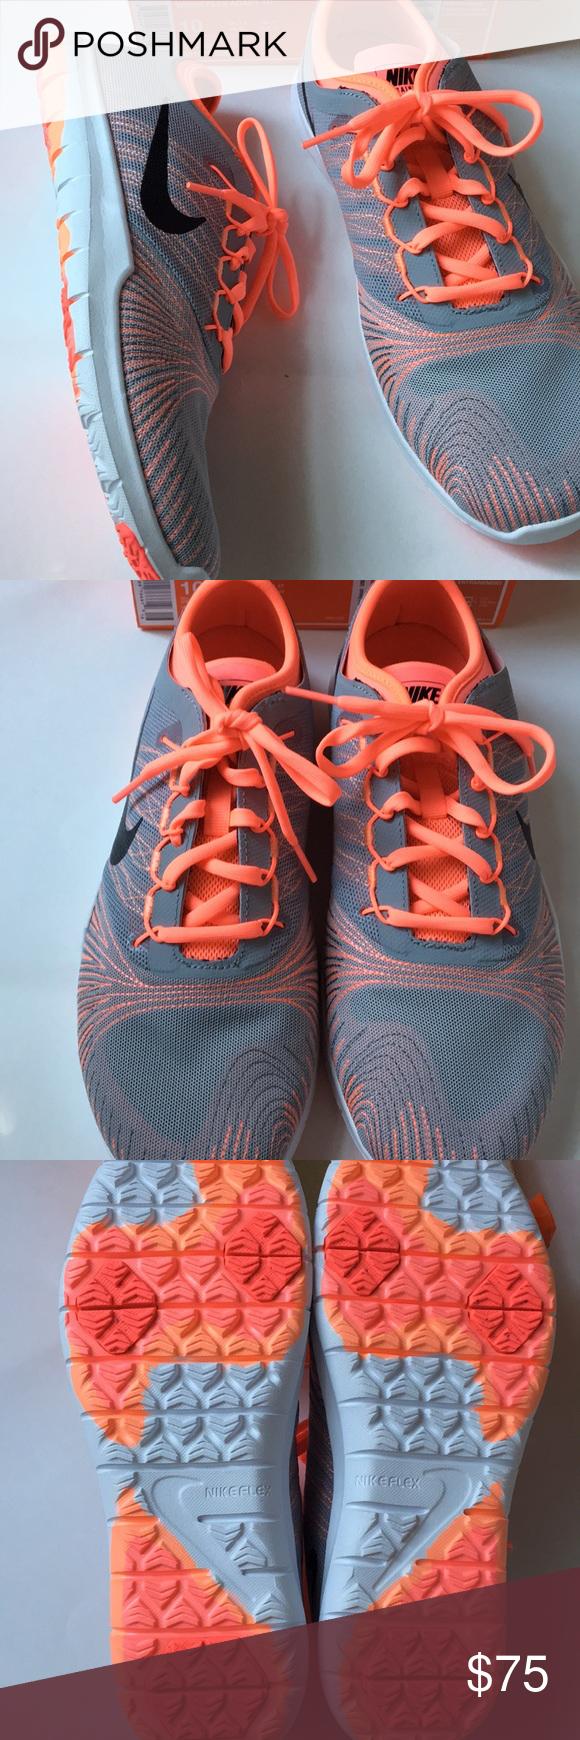 f43bdf5f96eb0c Women s flex adapt TR trainer Nike grey lava glow Women s flex adapt TR trainer  Nike grey lava glow sneaker show new in box (box missing lid) Color is more  ...